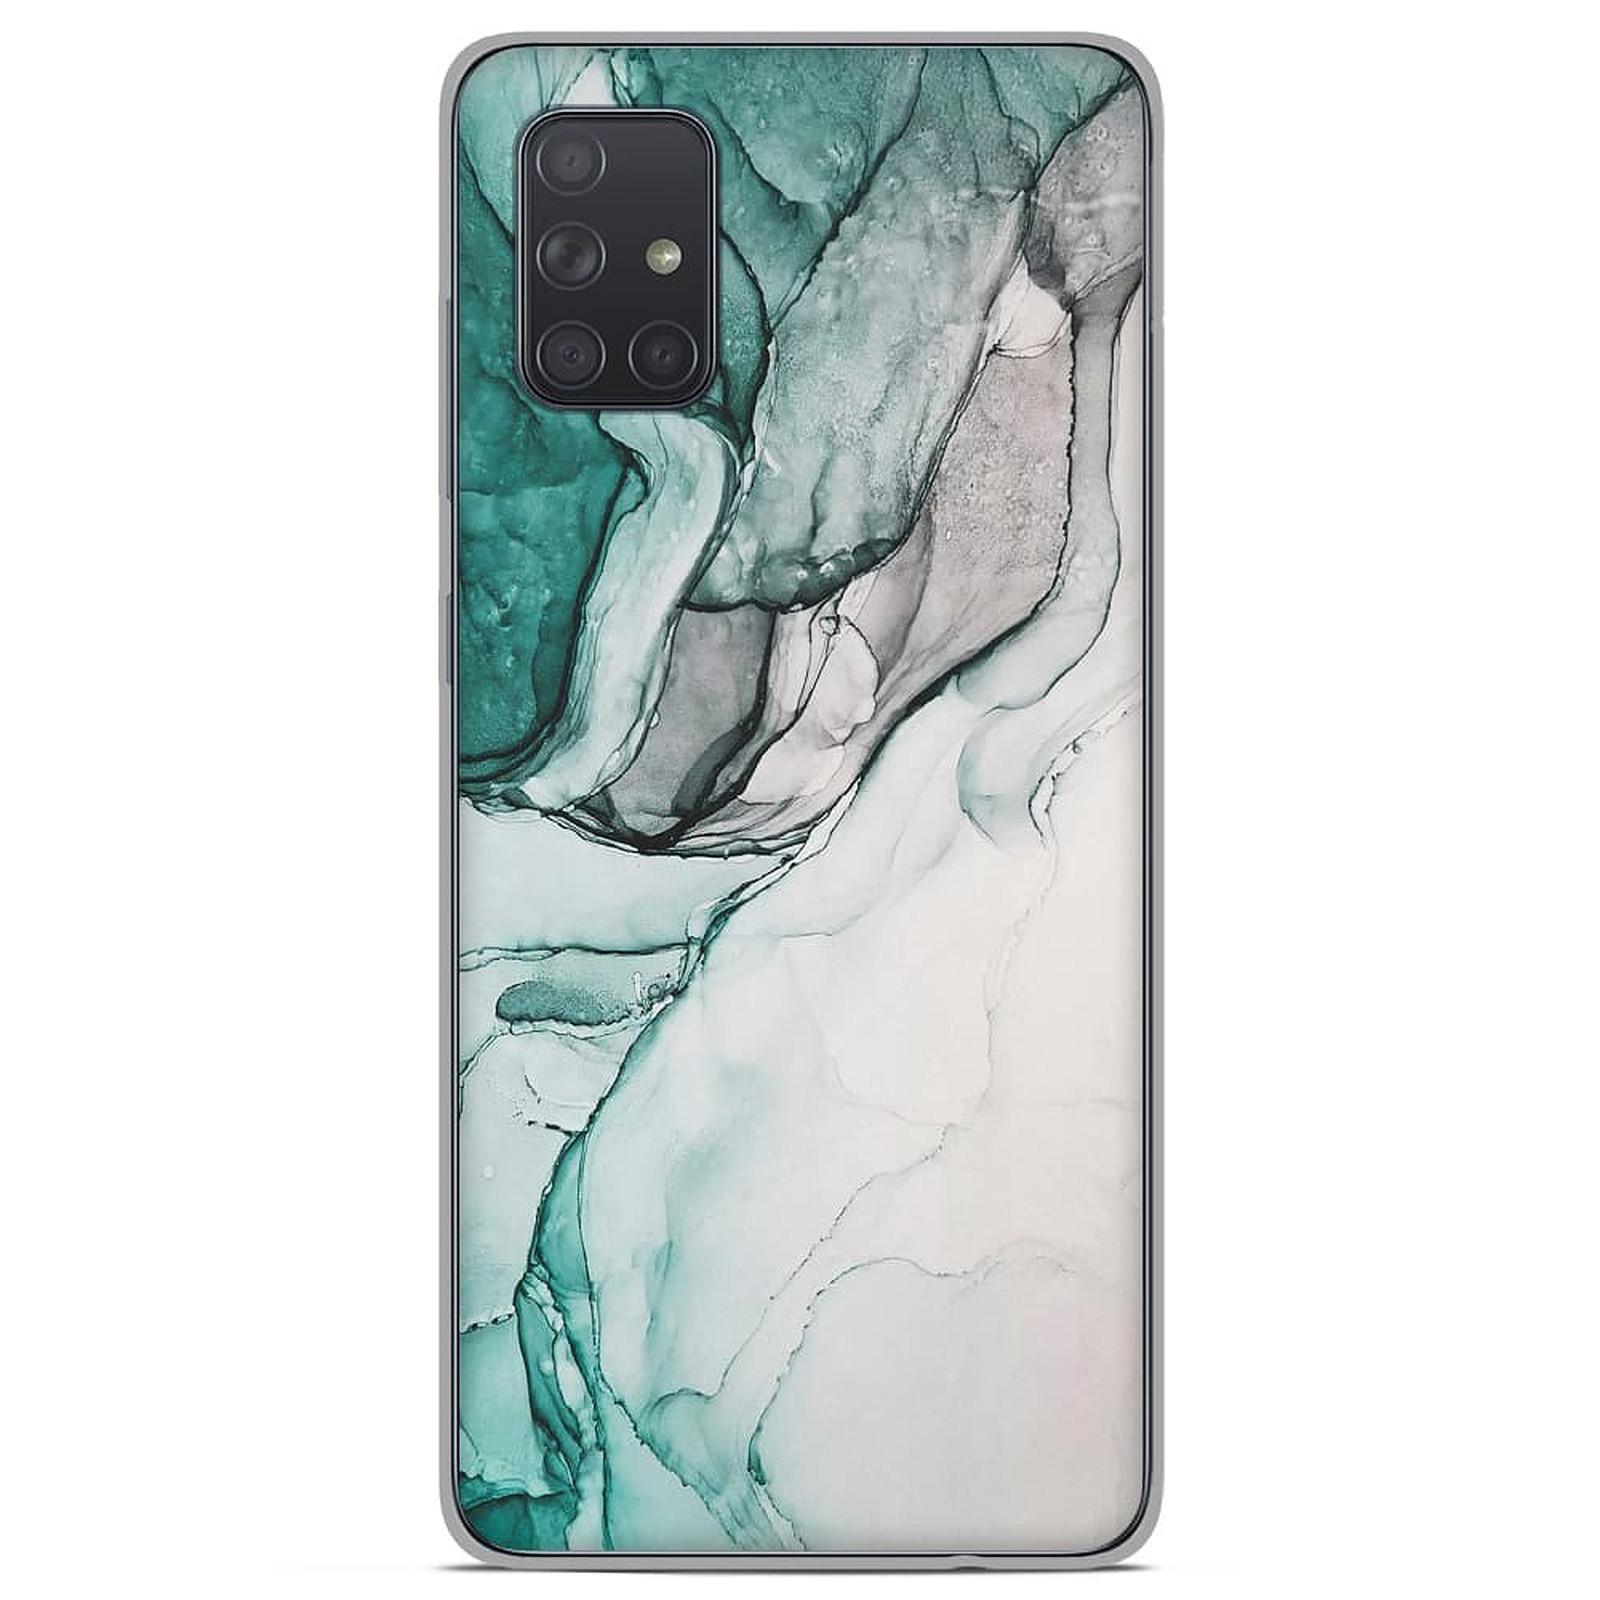 1001 Coques Coque silicone gel Samsung Galaxy A51 motif Zoom sur Pierre Vert - Coque téléphone 1001Coques sur LDLC